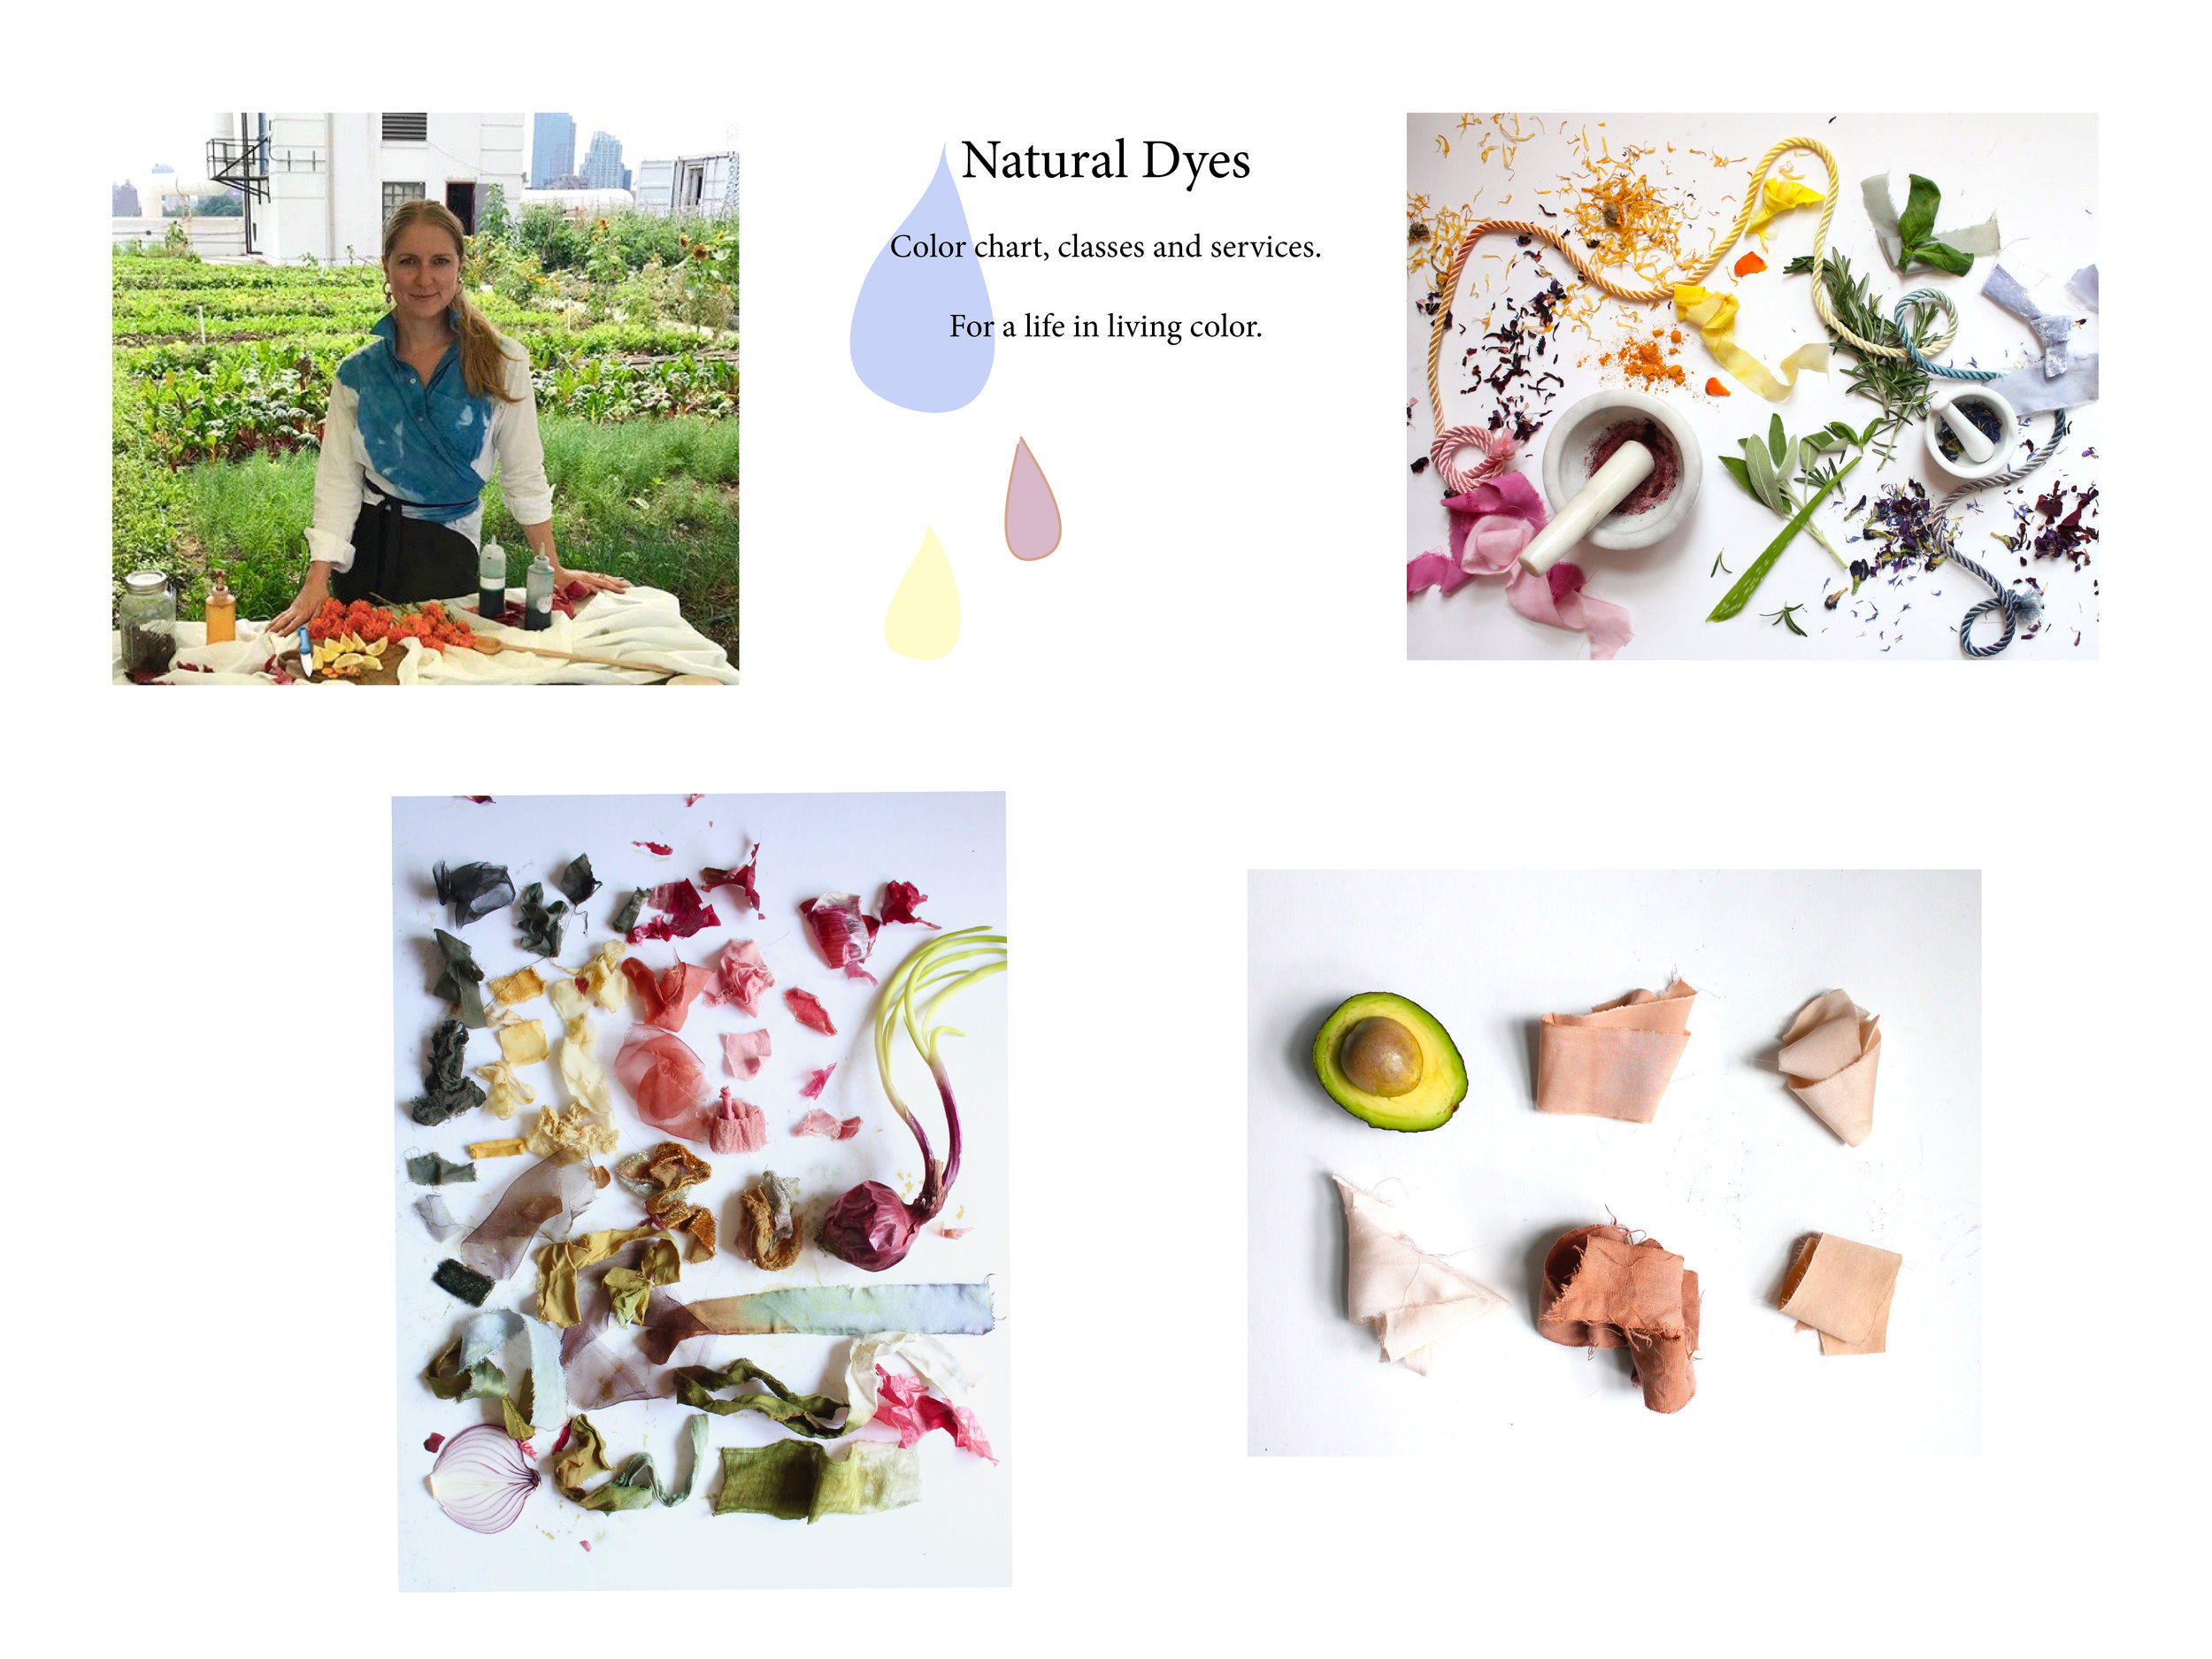 Natural Dyes Landing Page.jpg